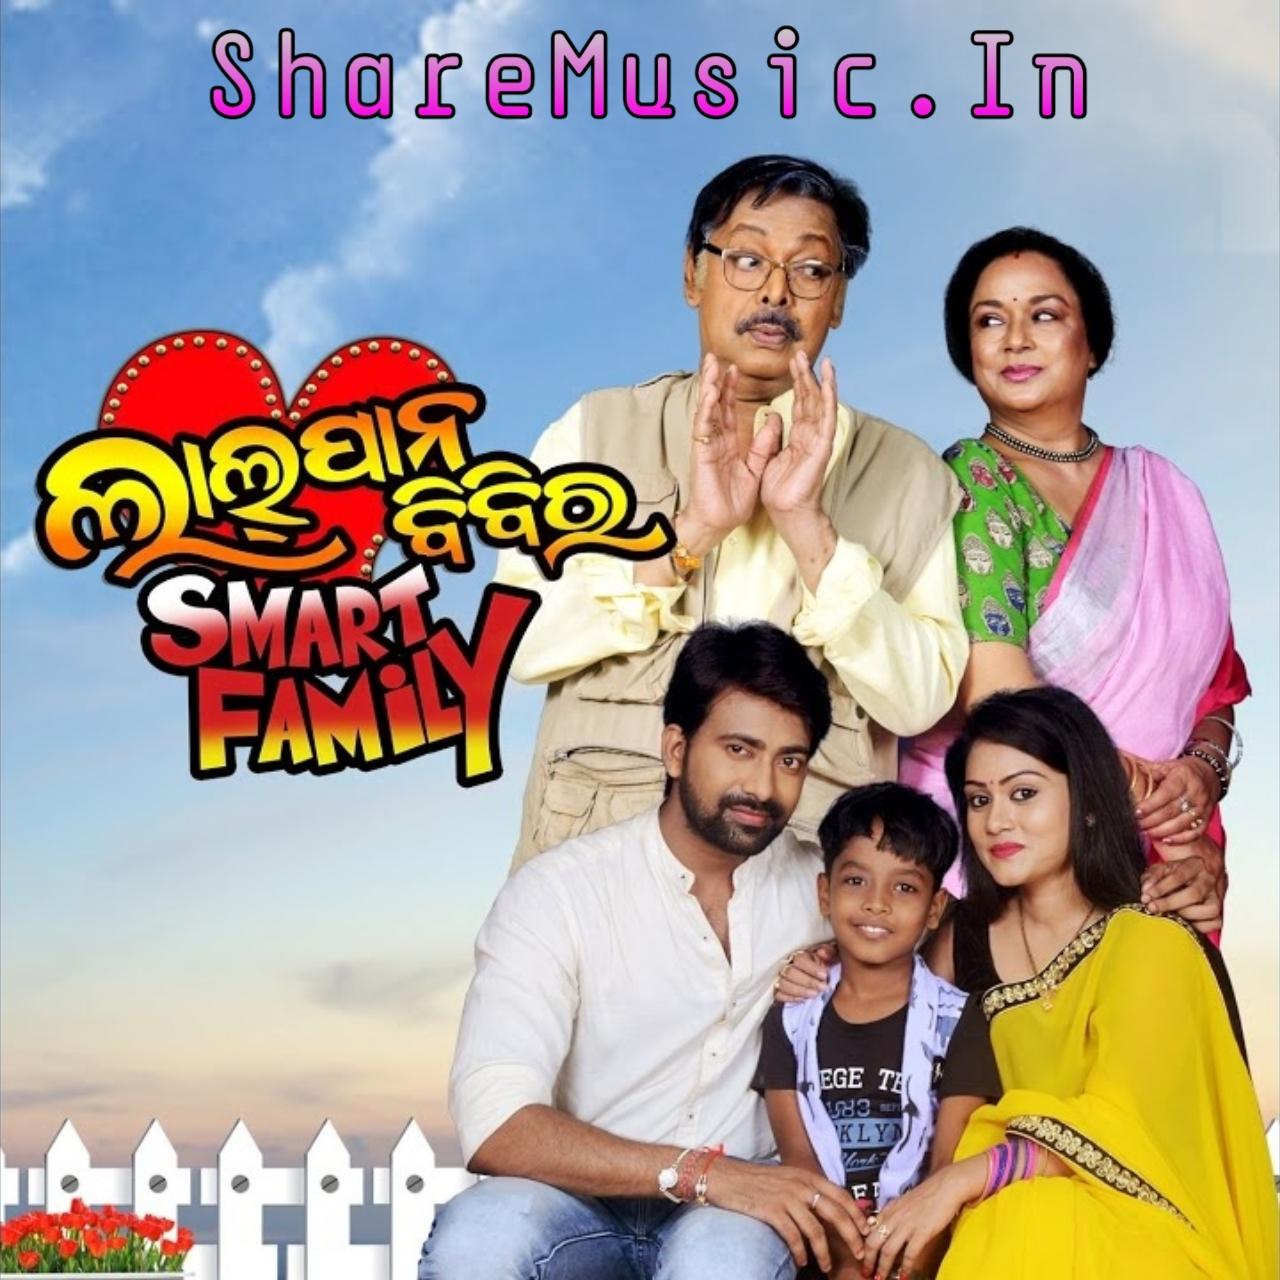 Lalpan Bibi Ra Smart Family Poster